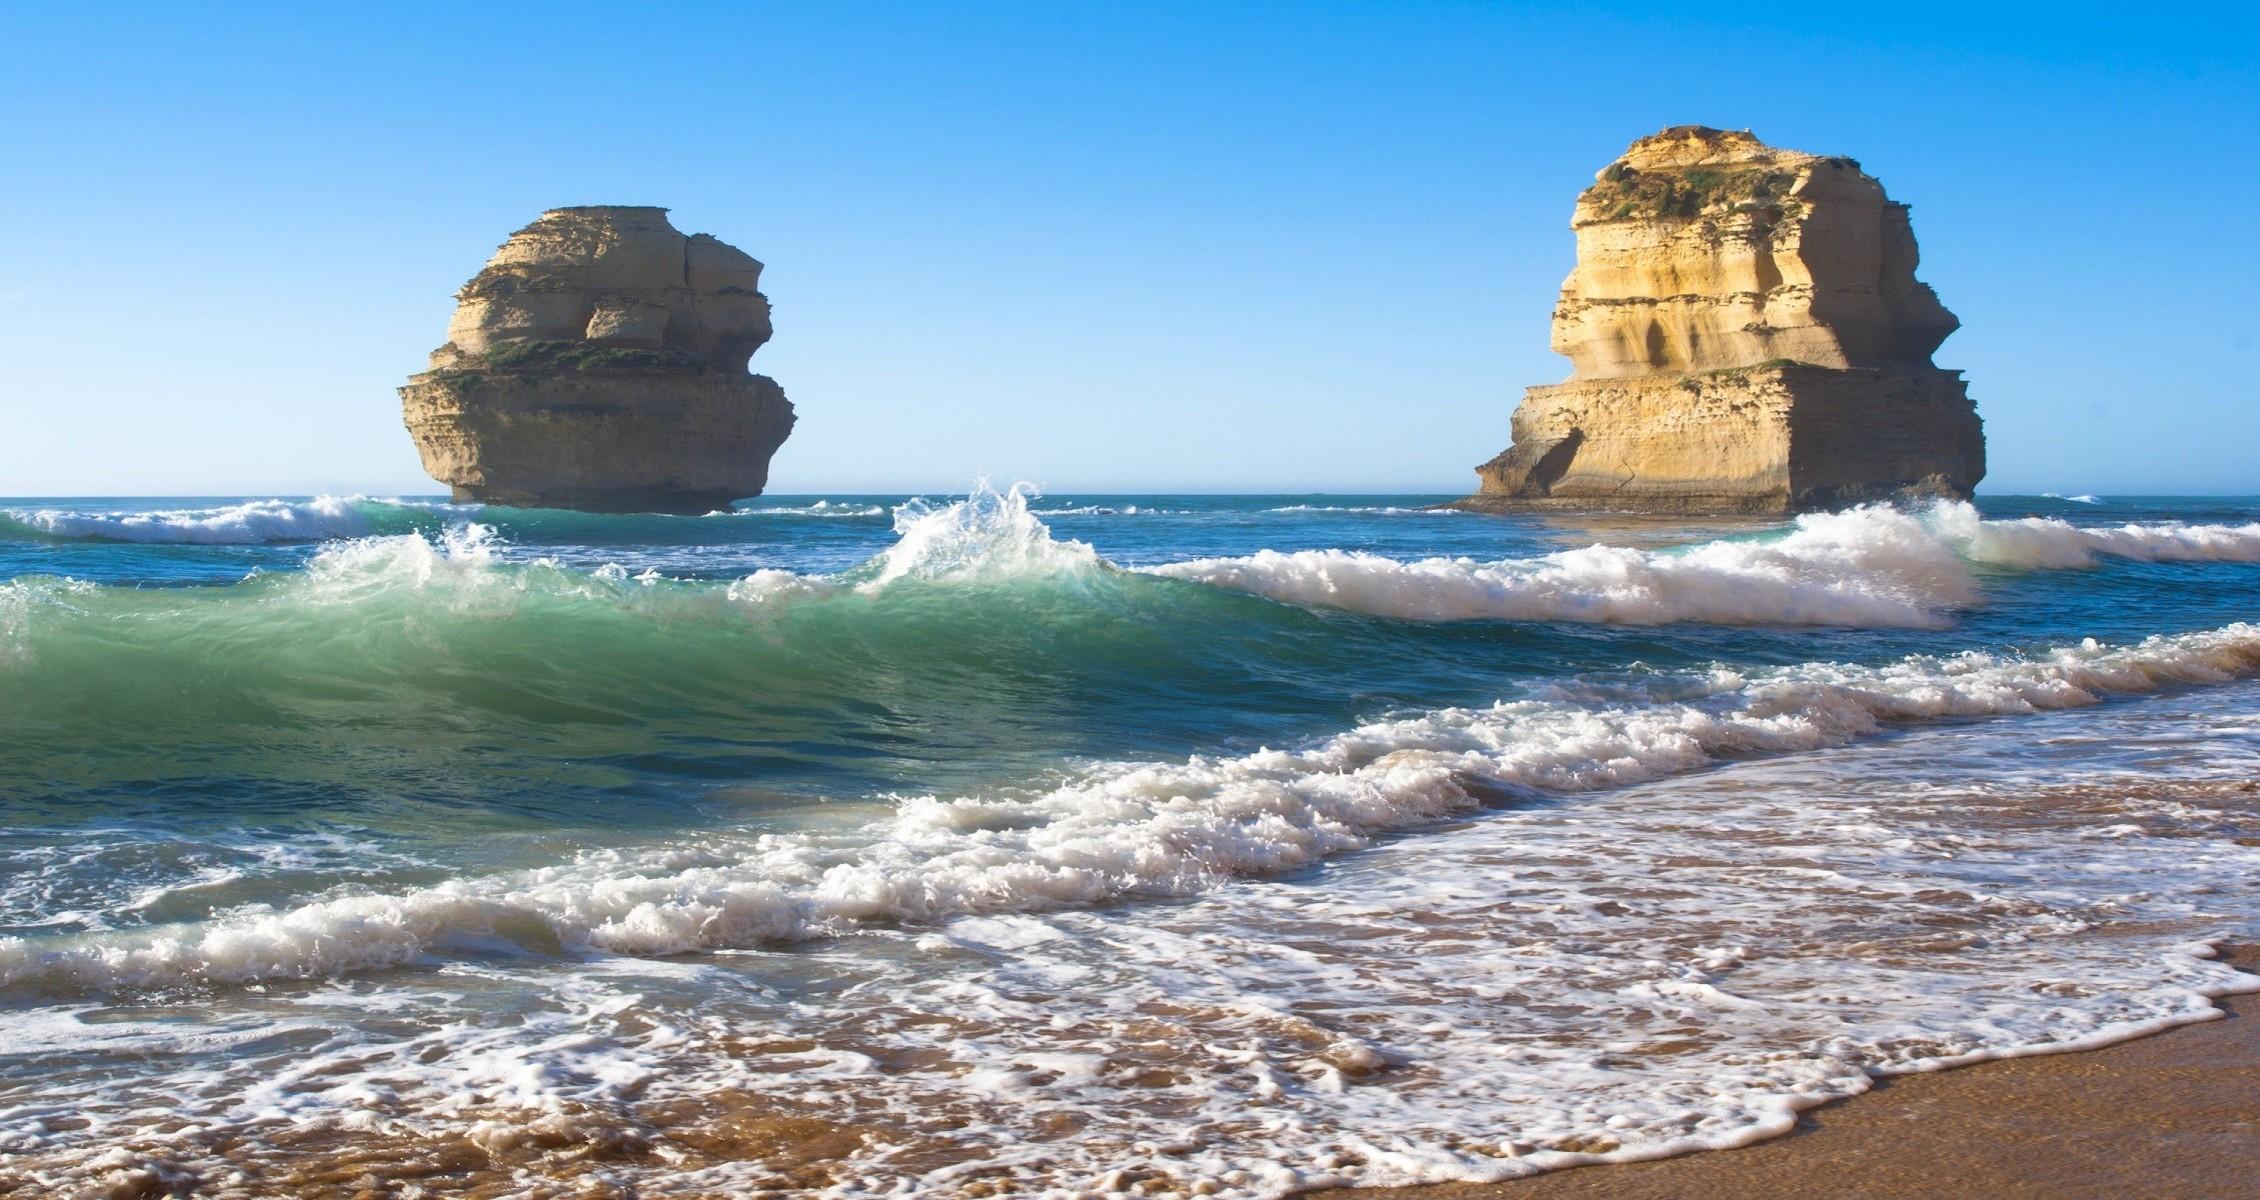 Wallpaper Landscape Sea Rock Nature Shore Sand Beach